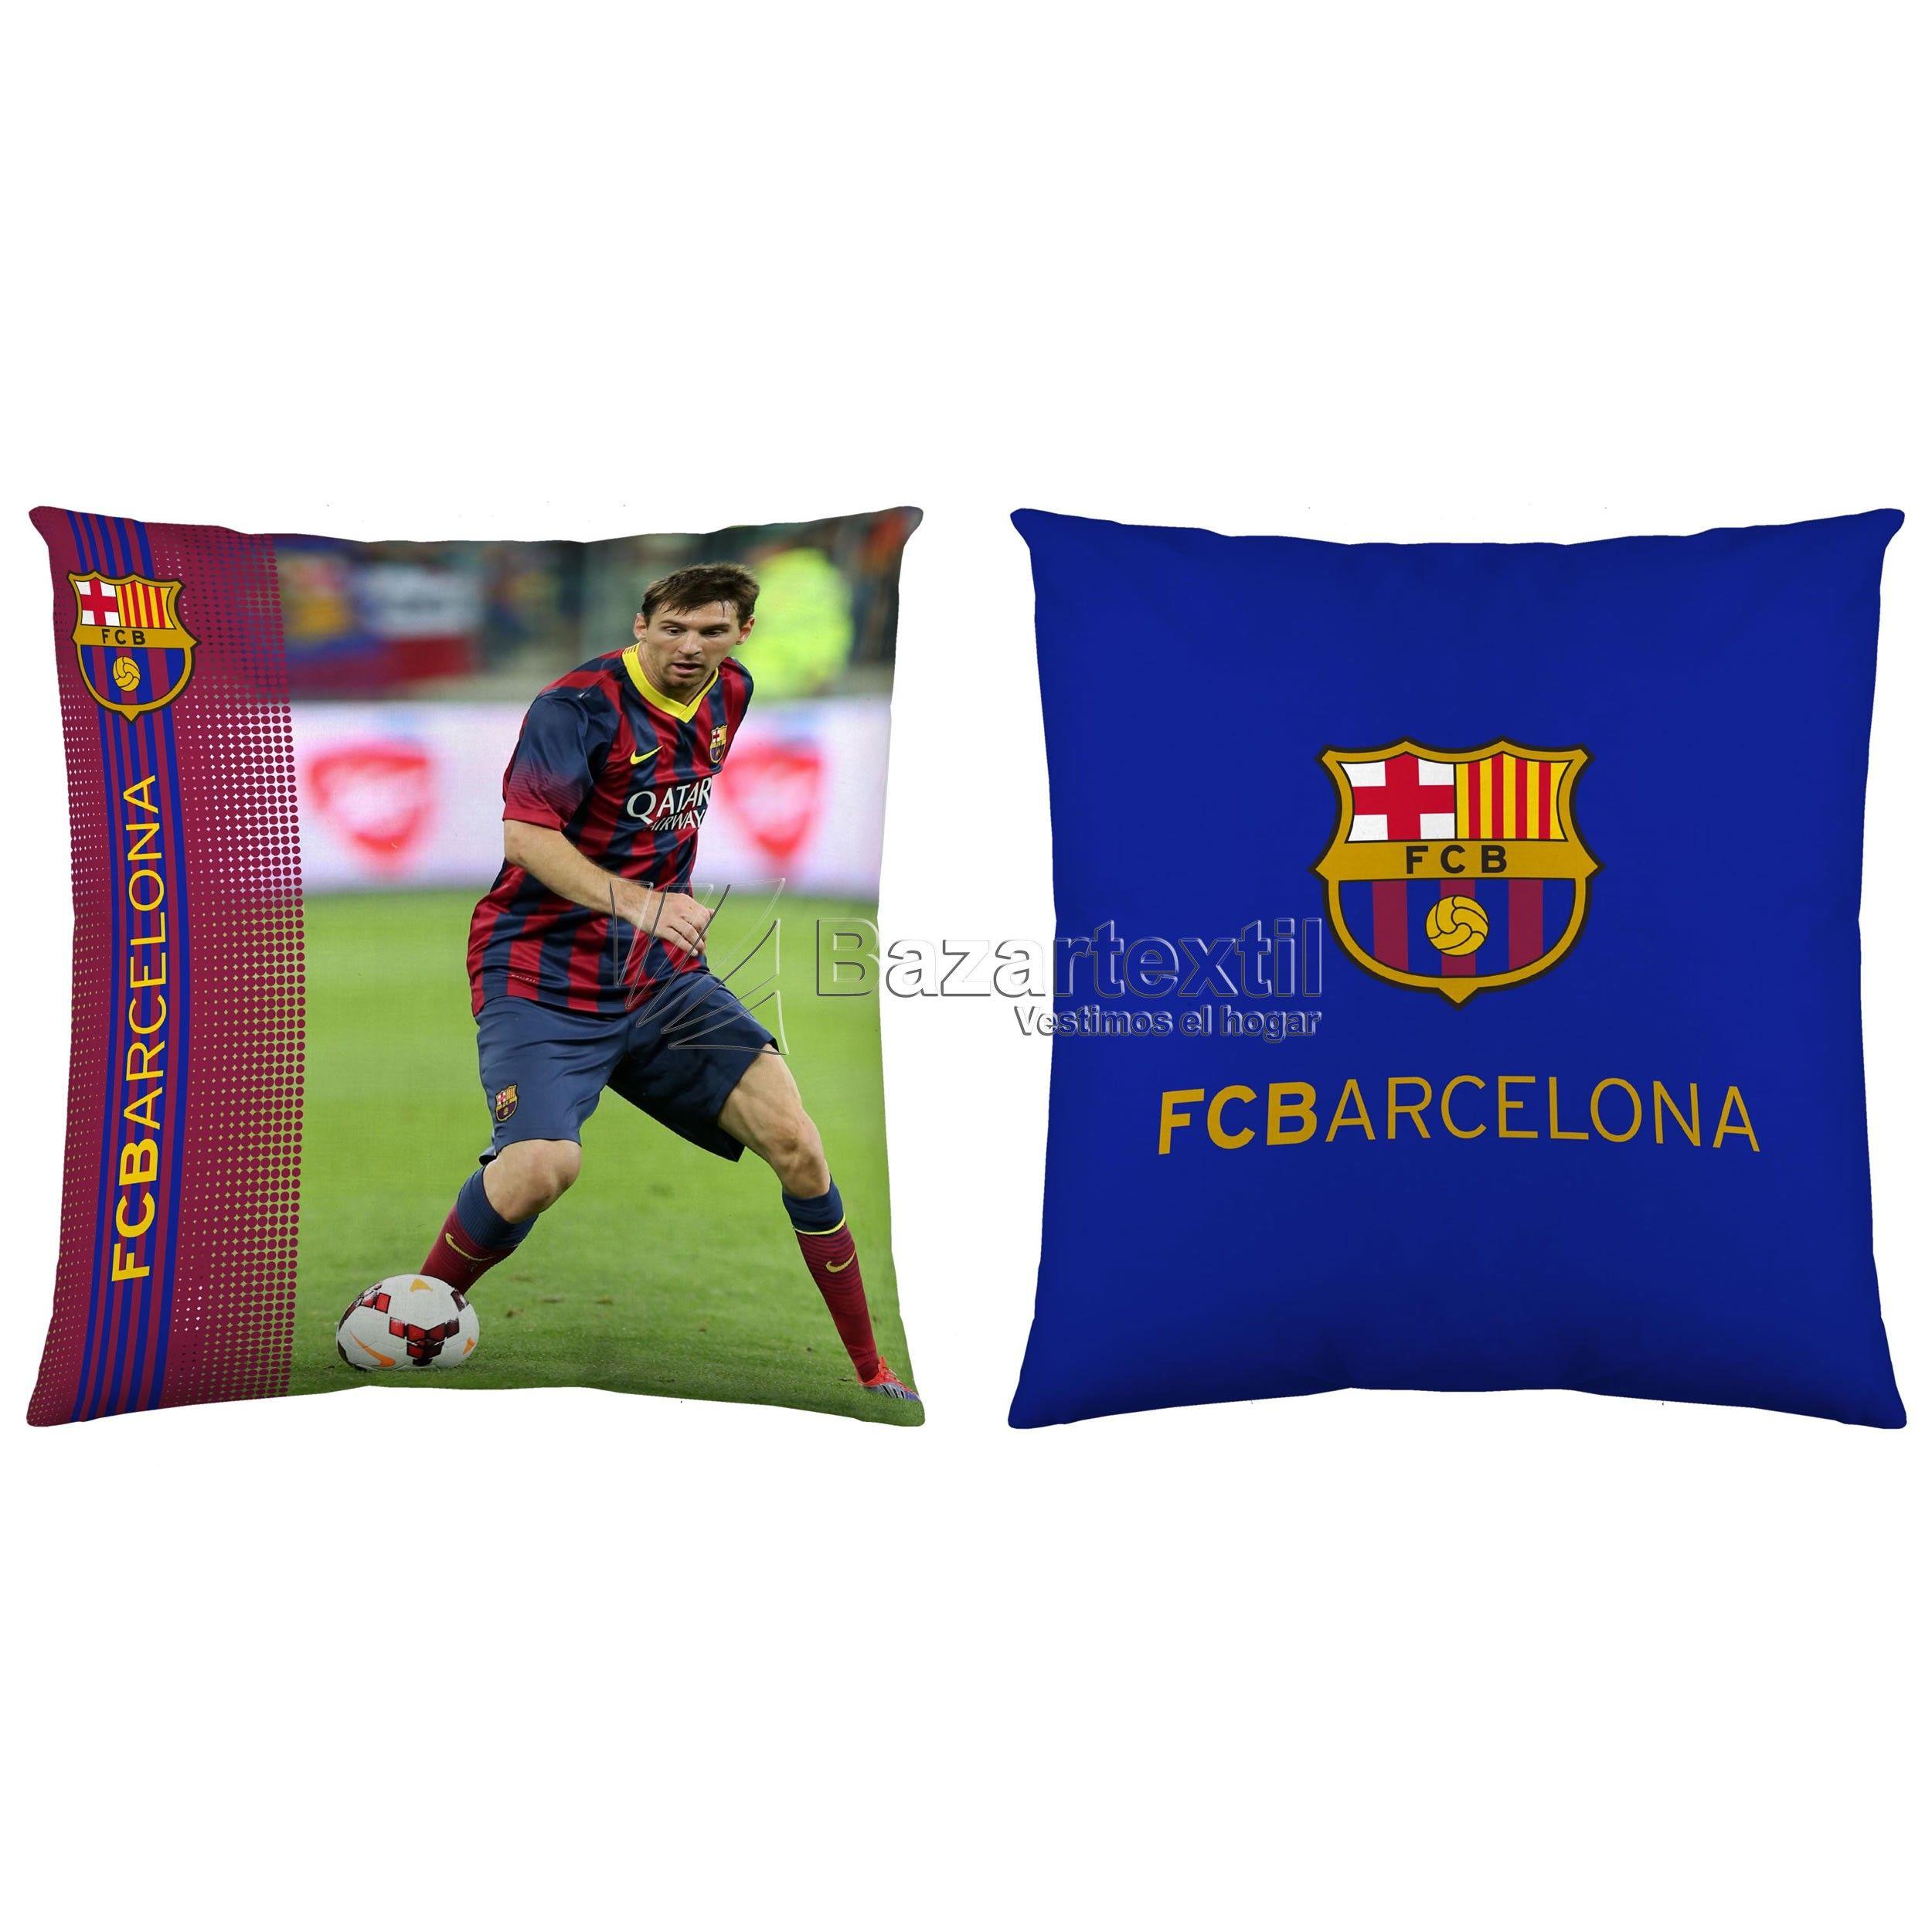 Cojines Messi FC Barcelona   Bazartextil.  F.C. Barcelona 2015